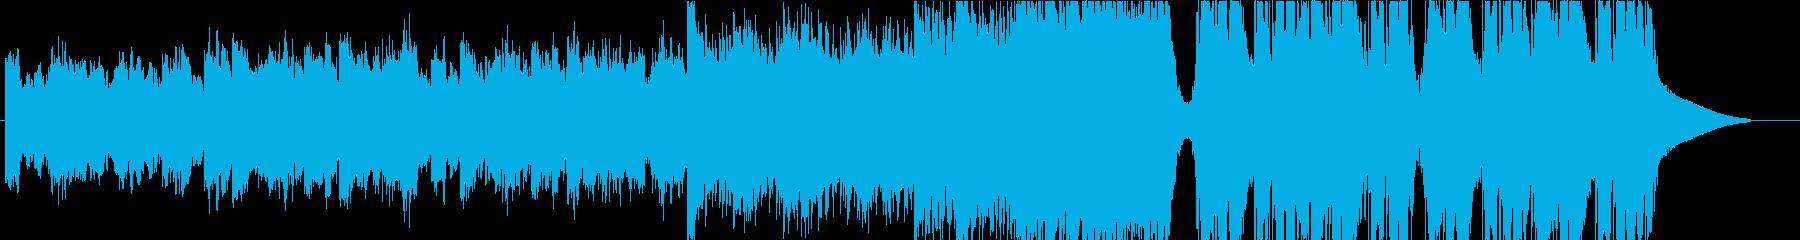 Future Bass アンビエントの再生済みの波形